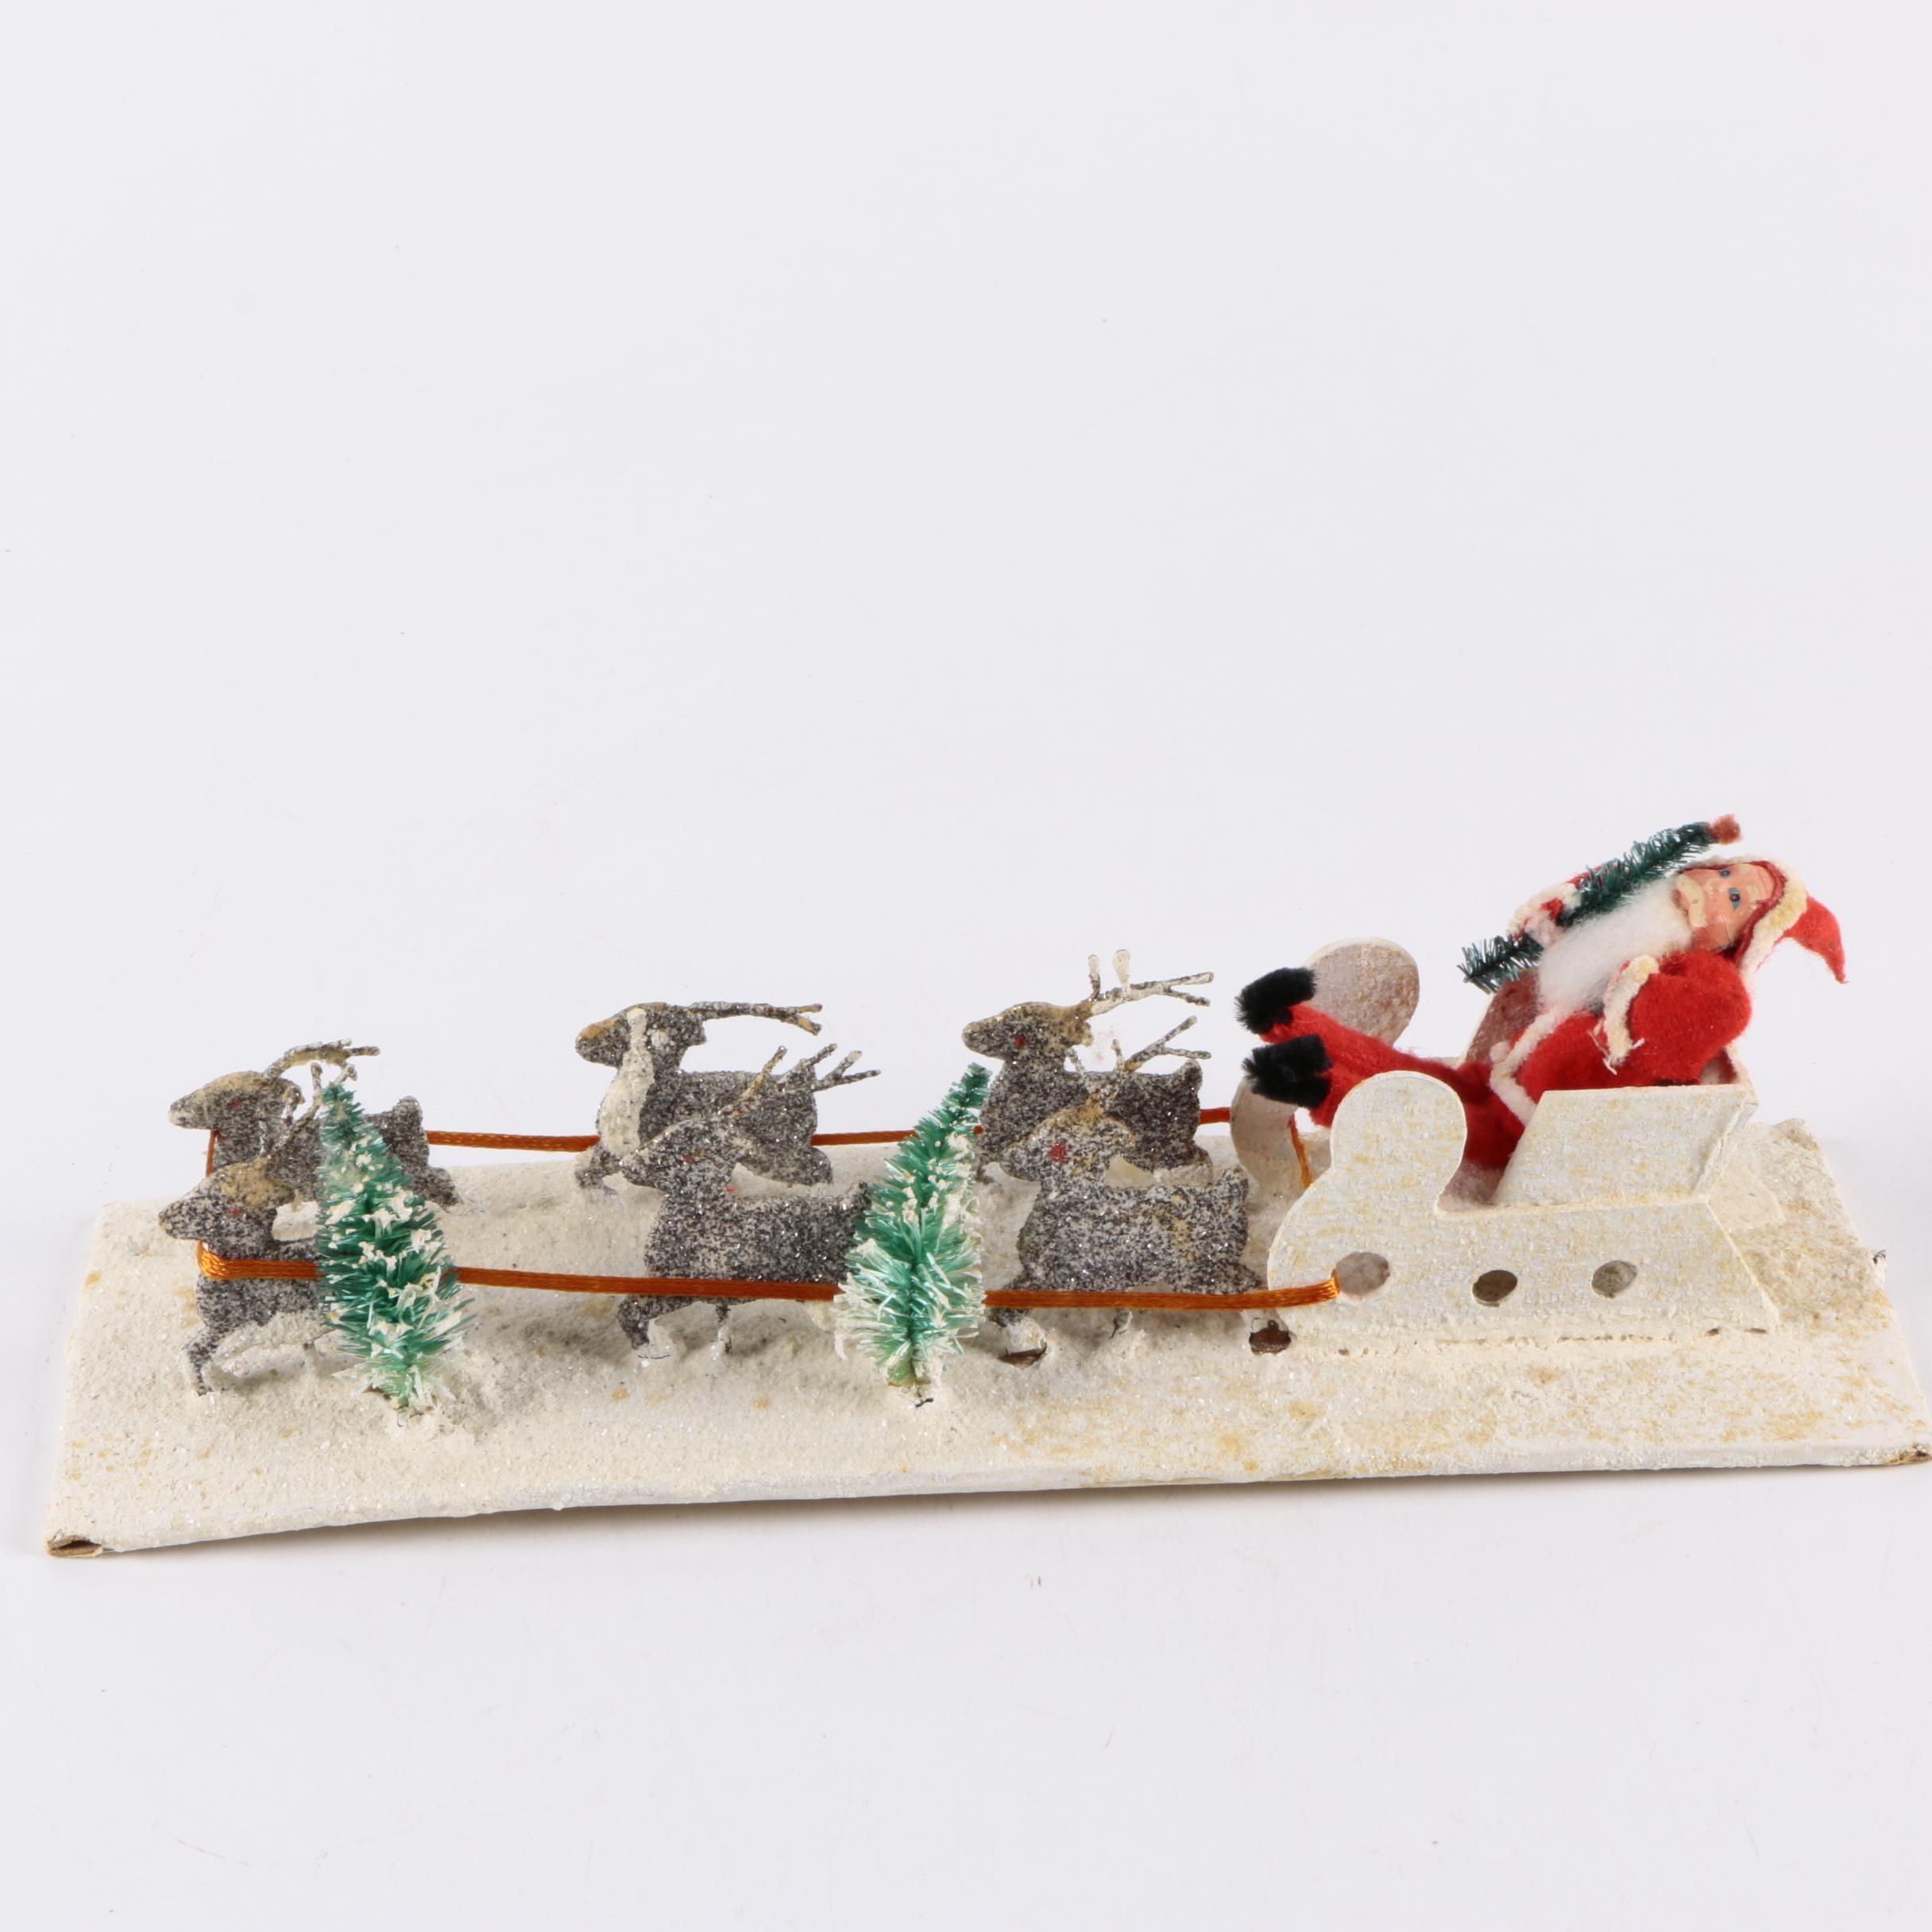 Vintage Santa Clause and Sleigh Christmas Decoration